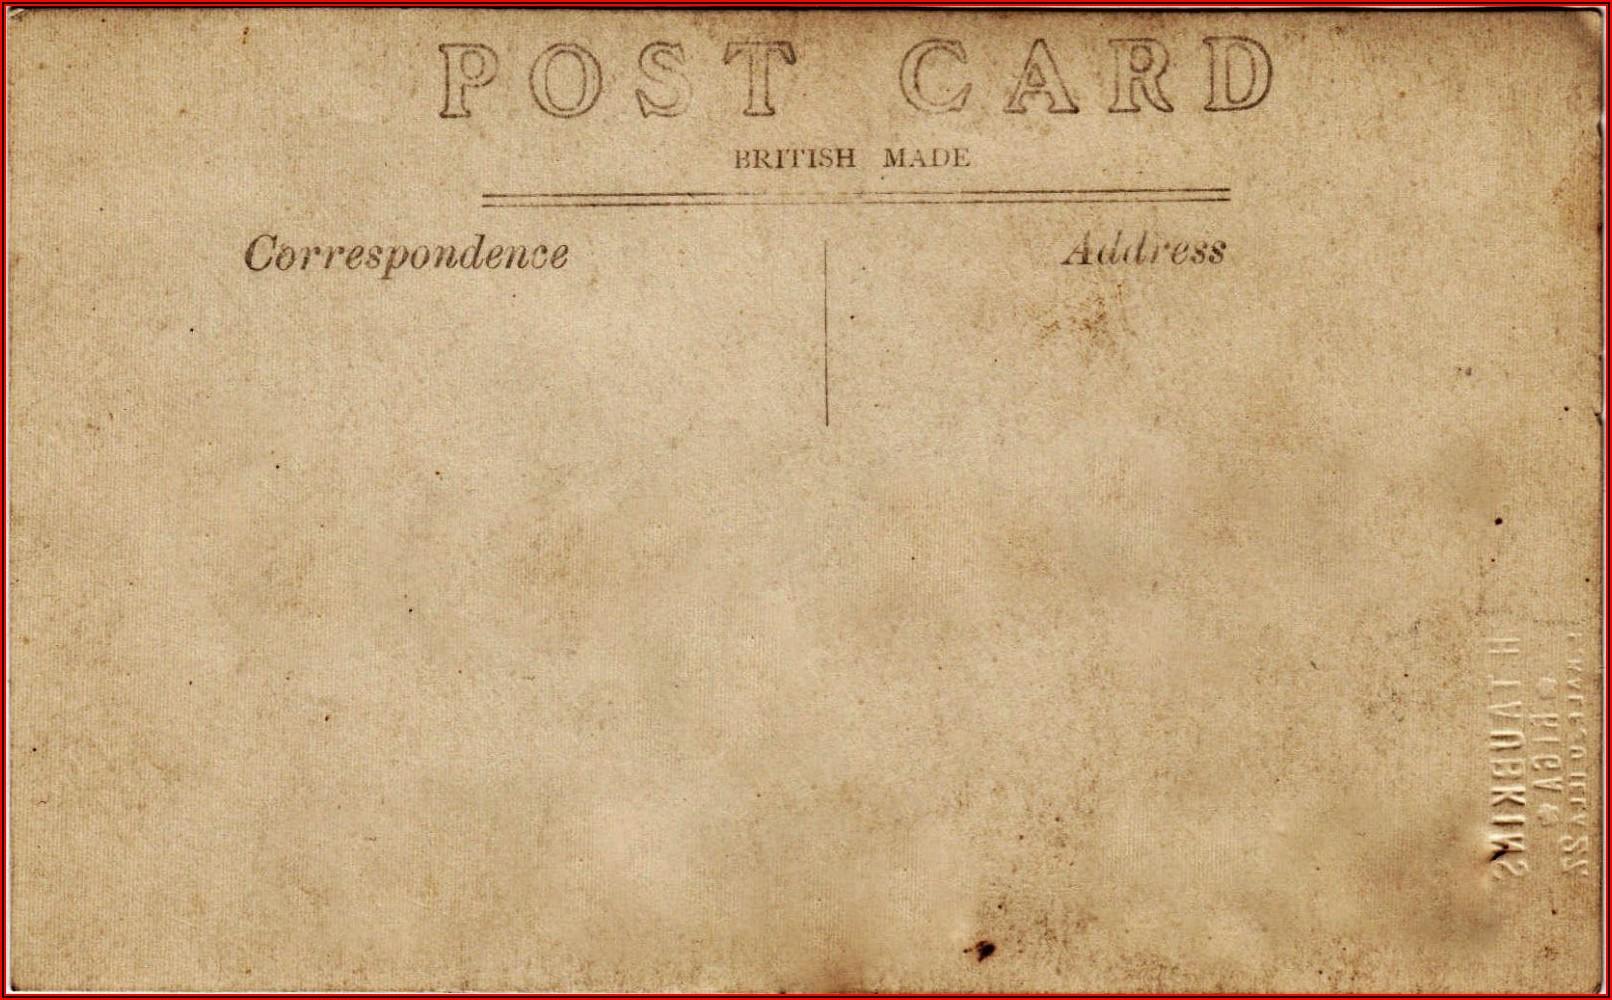 Avery Postcard Template 8387